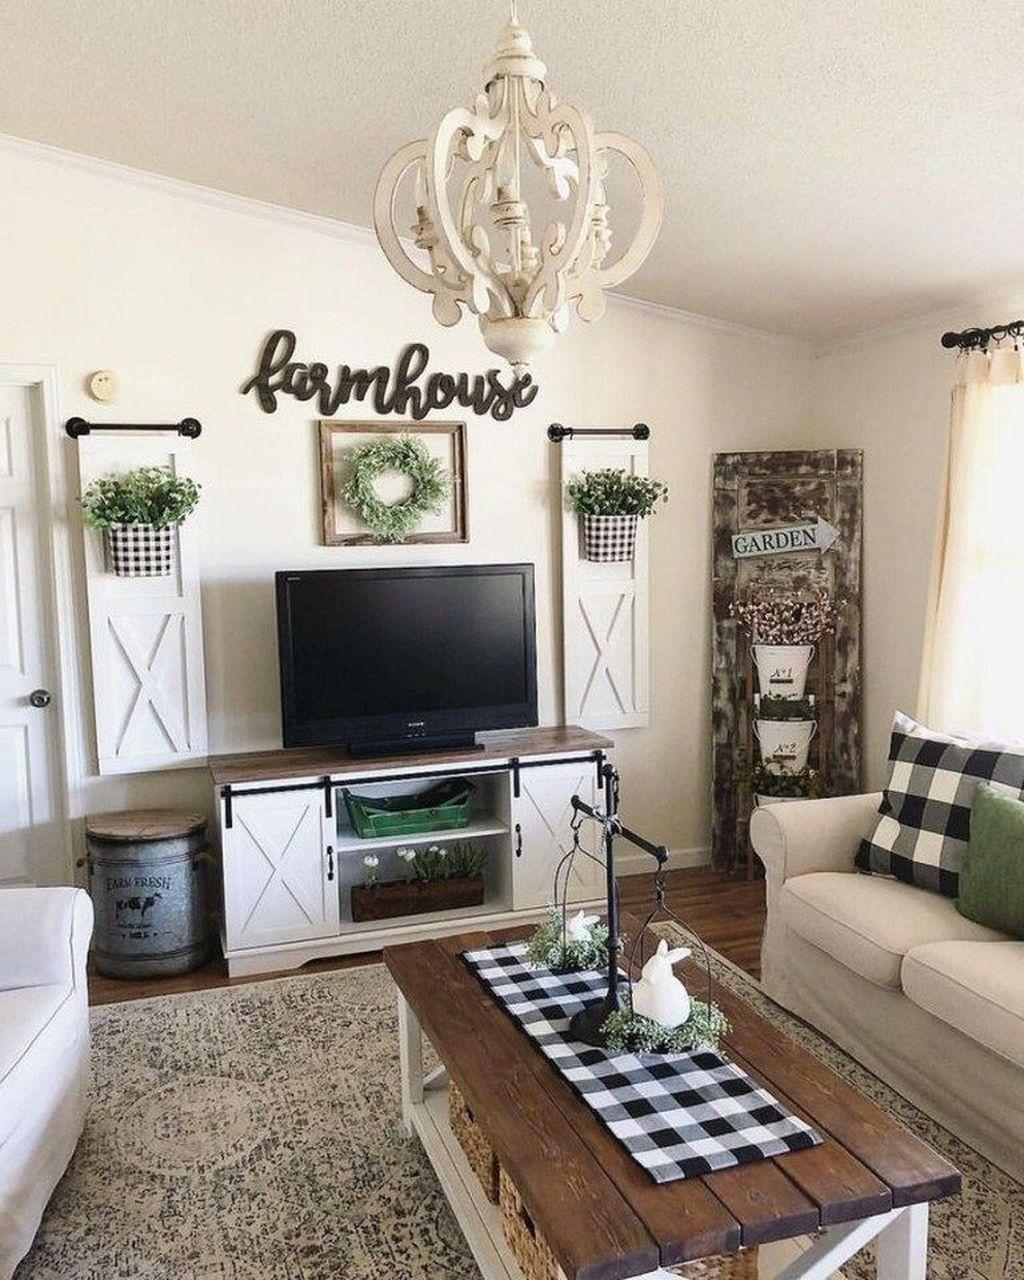 Excellent Furniture Design Ideas For Your Living Room 35